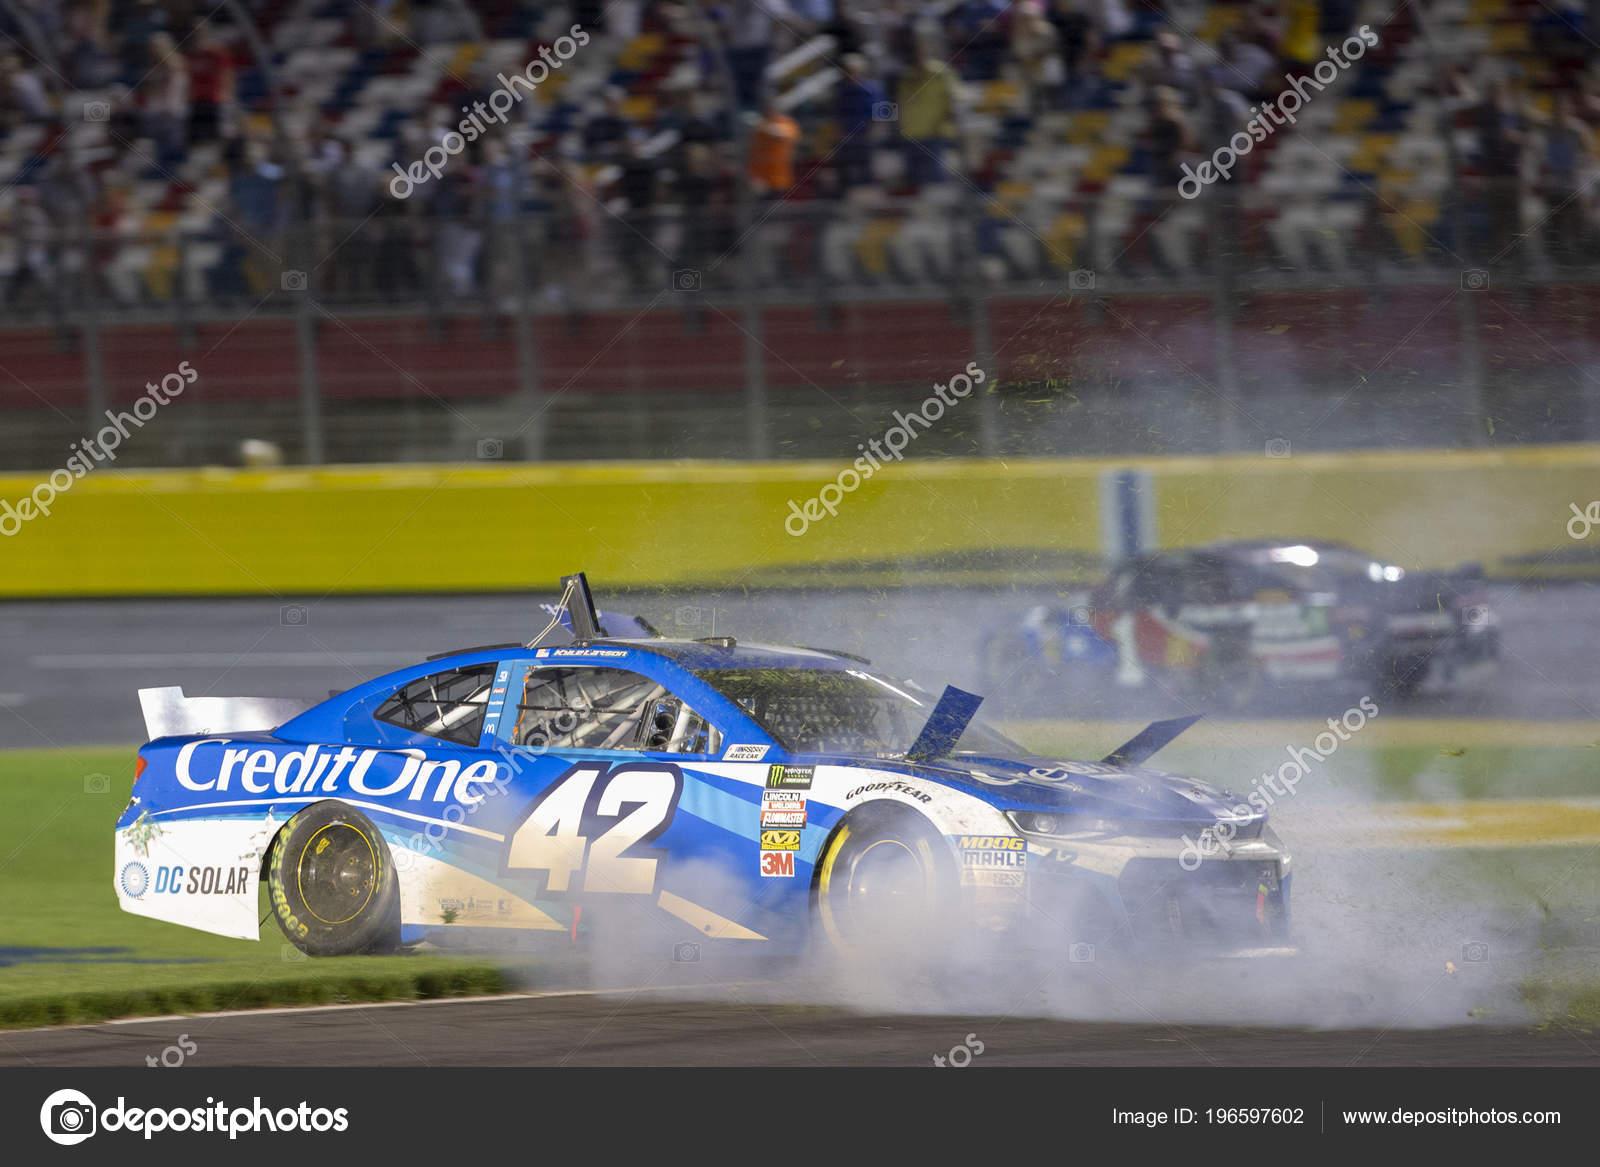 May 2018 Concord North Carolina Usa Kyle Larson Wrecks Monster Stock Photo